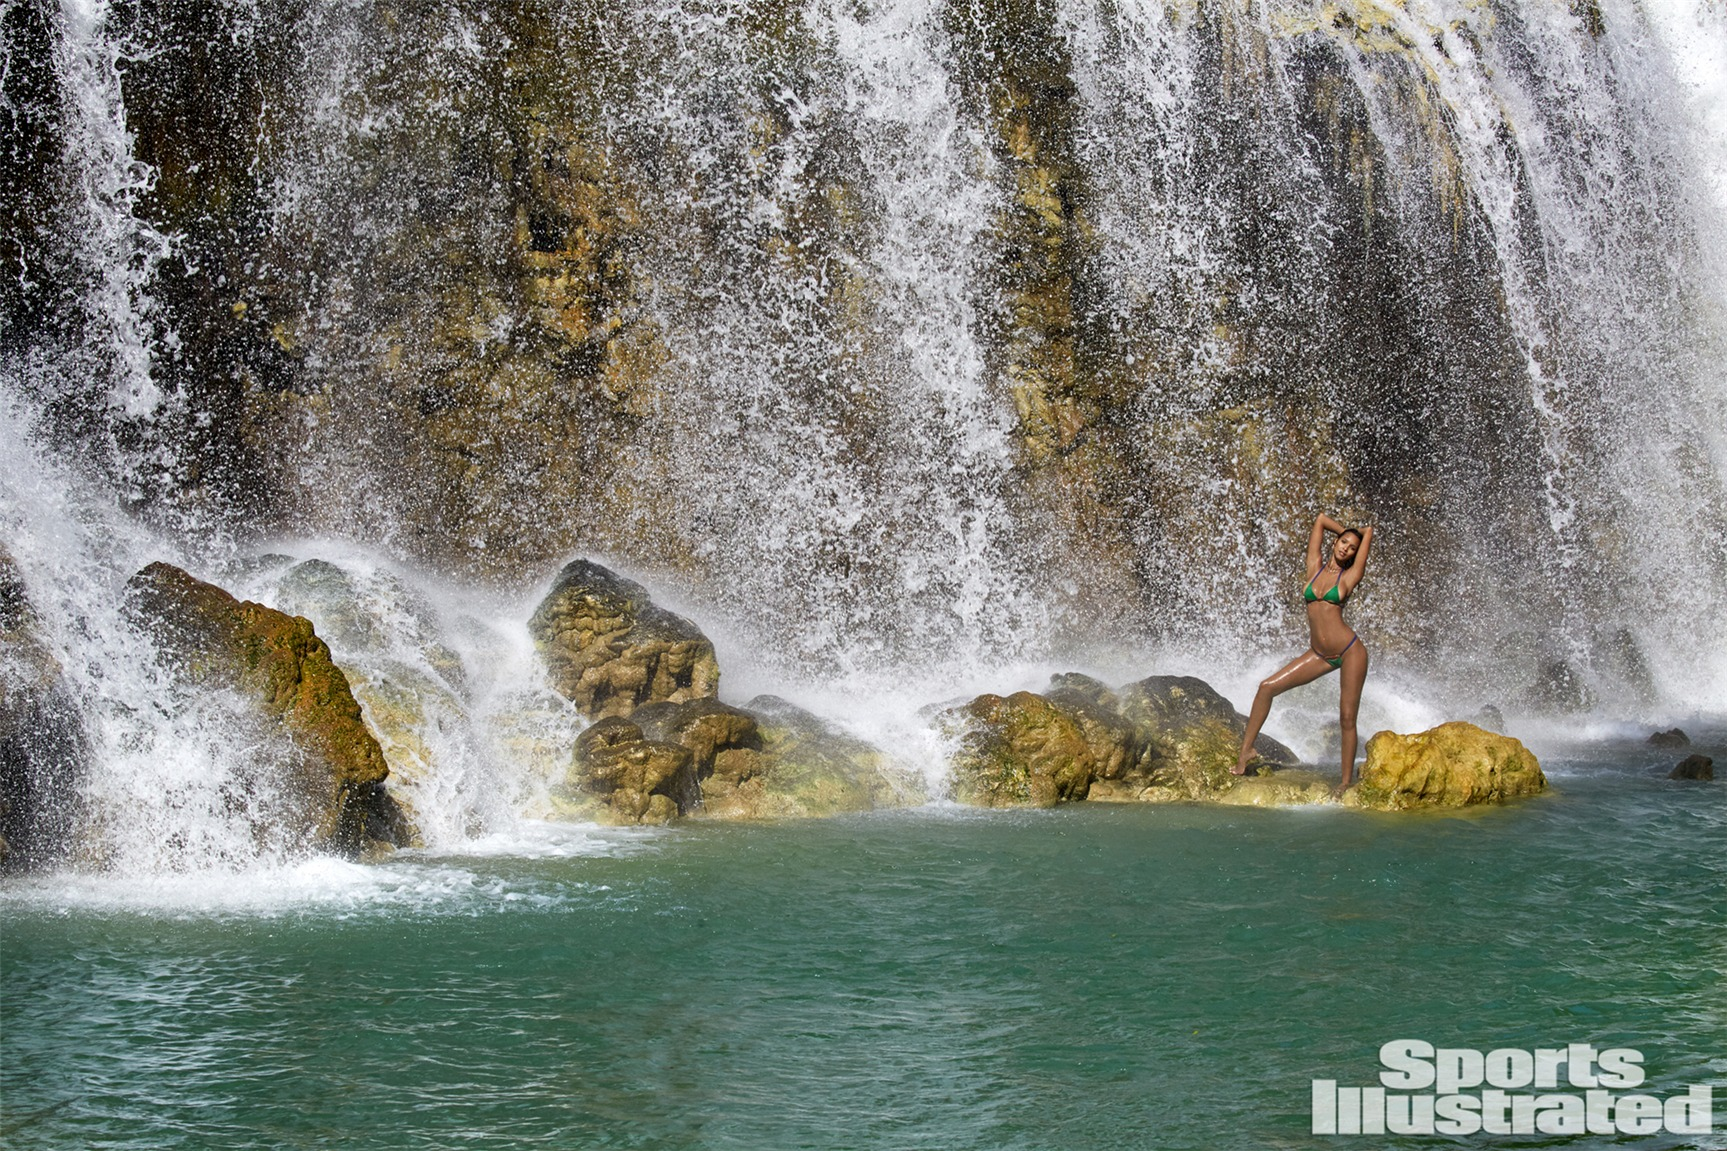 Lais Ribeiro / Лаис Рибейро в купальниках из новой коллекции Sports Illustrated Swimsuit 2017 issue / in Sumba Island by James Macari